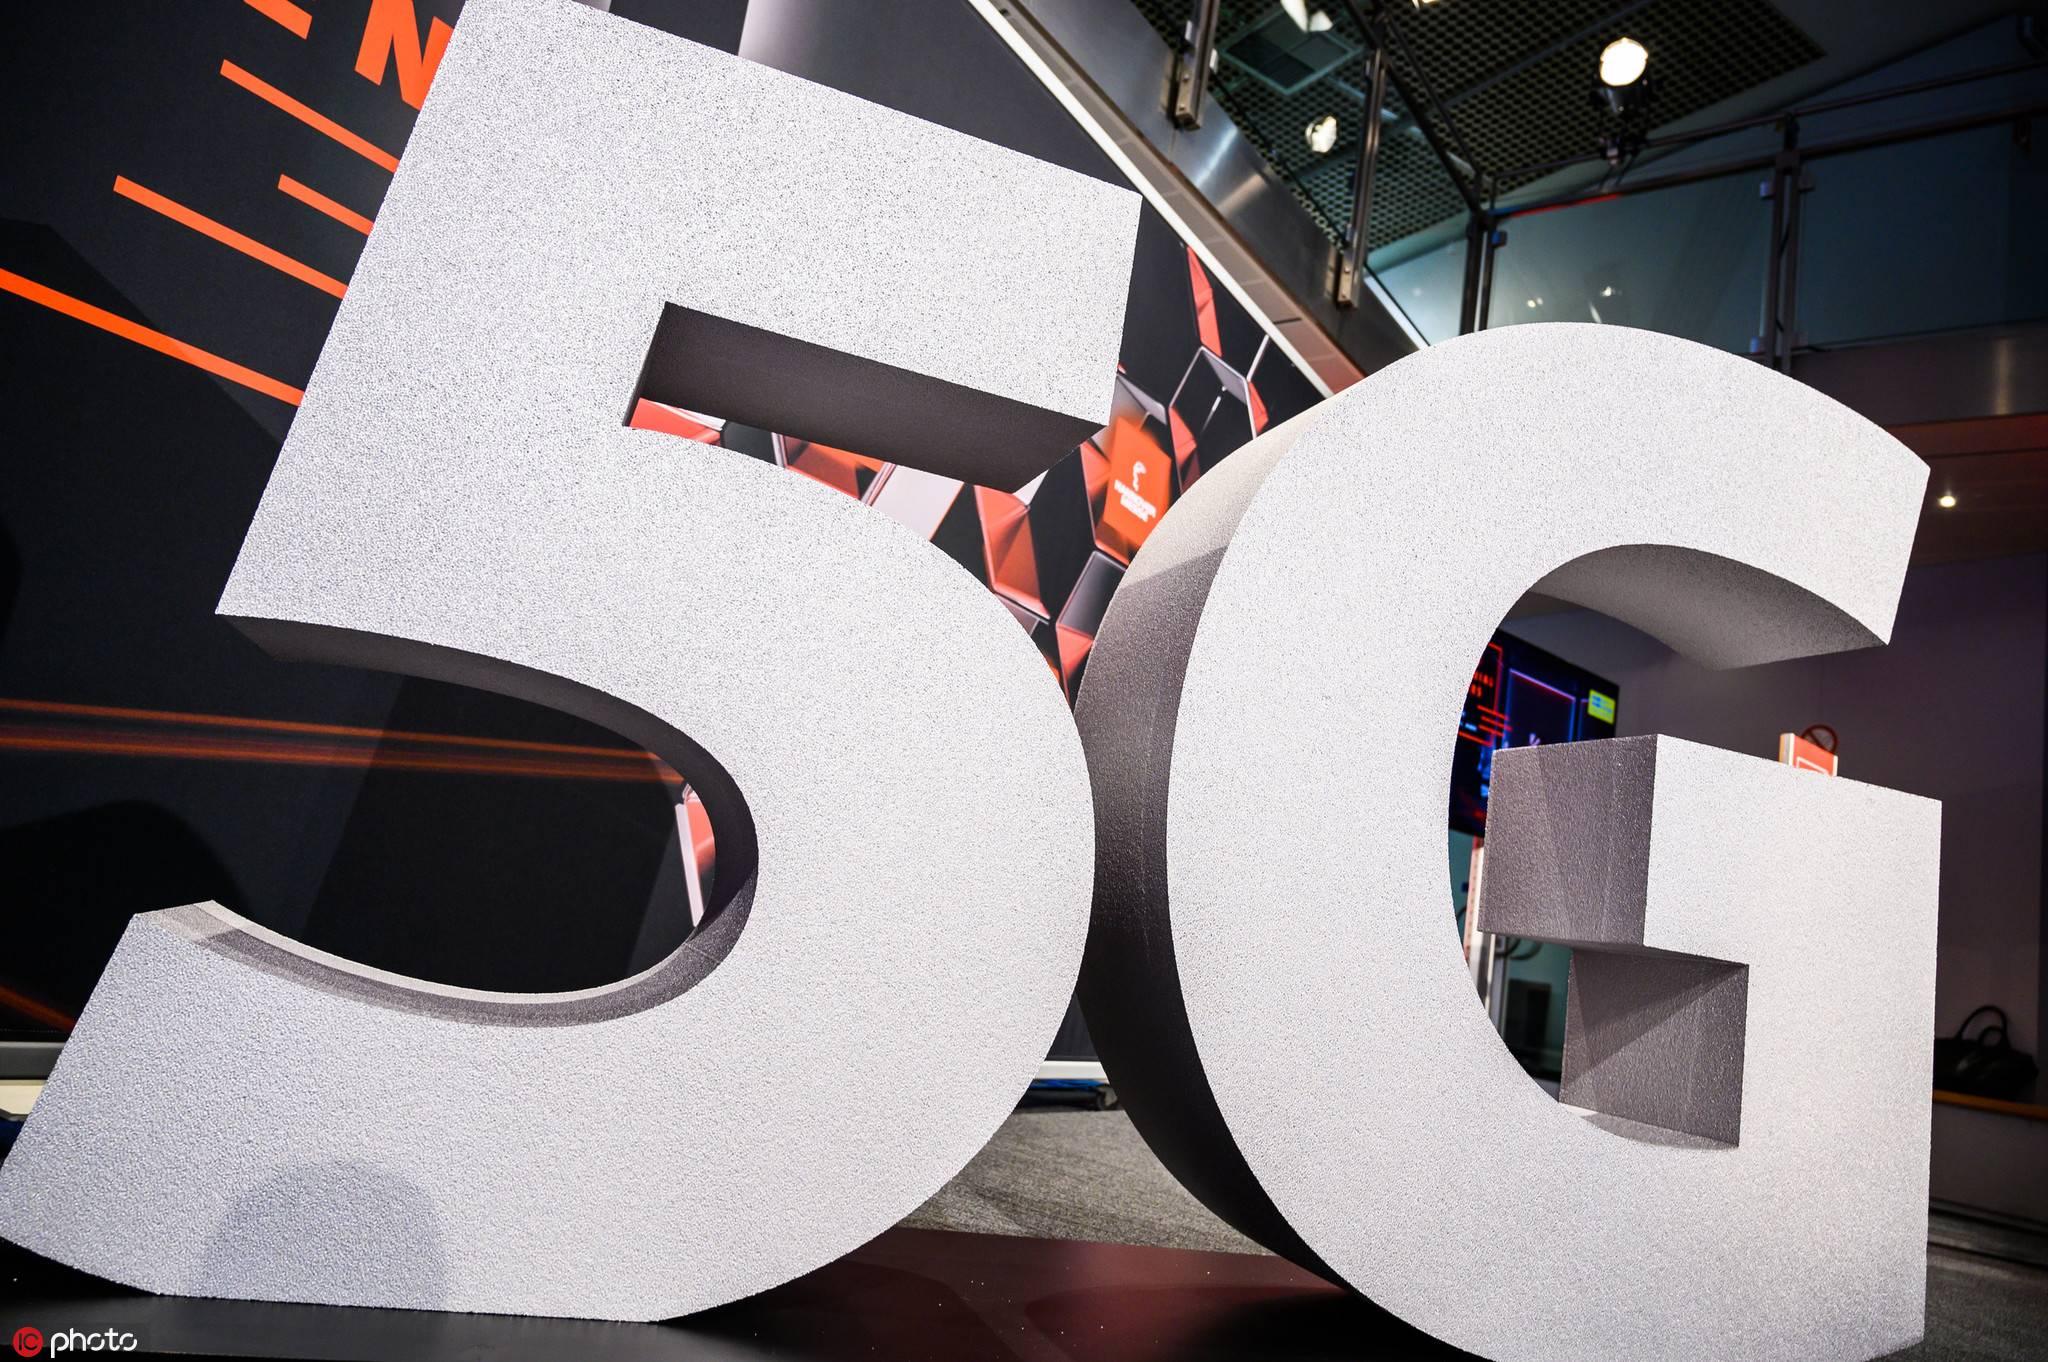 5G,5G,5G+VR,智能讲解,5G+文旅,5G物联峰会